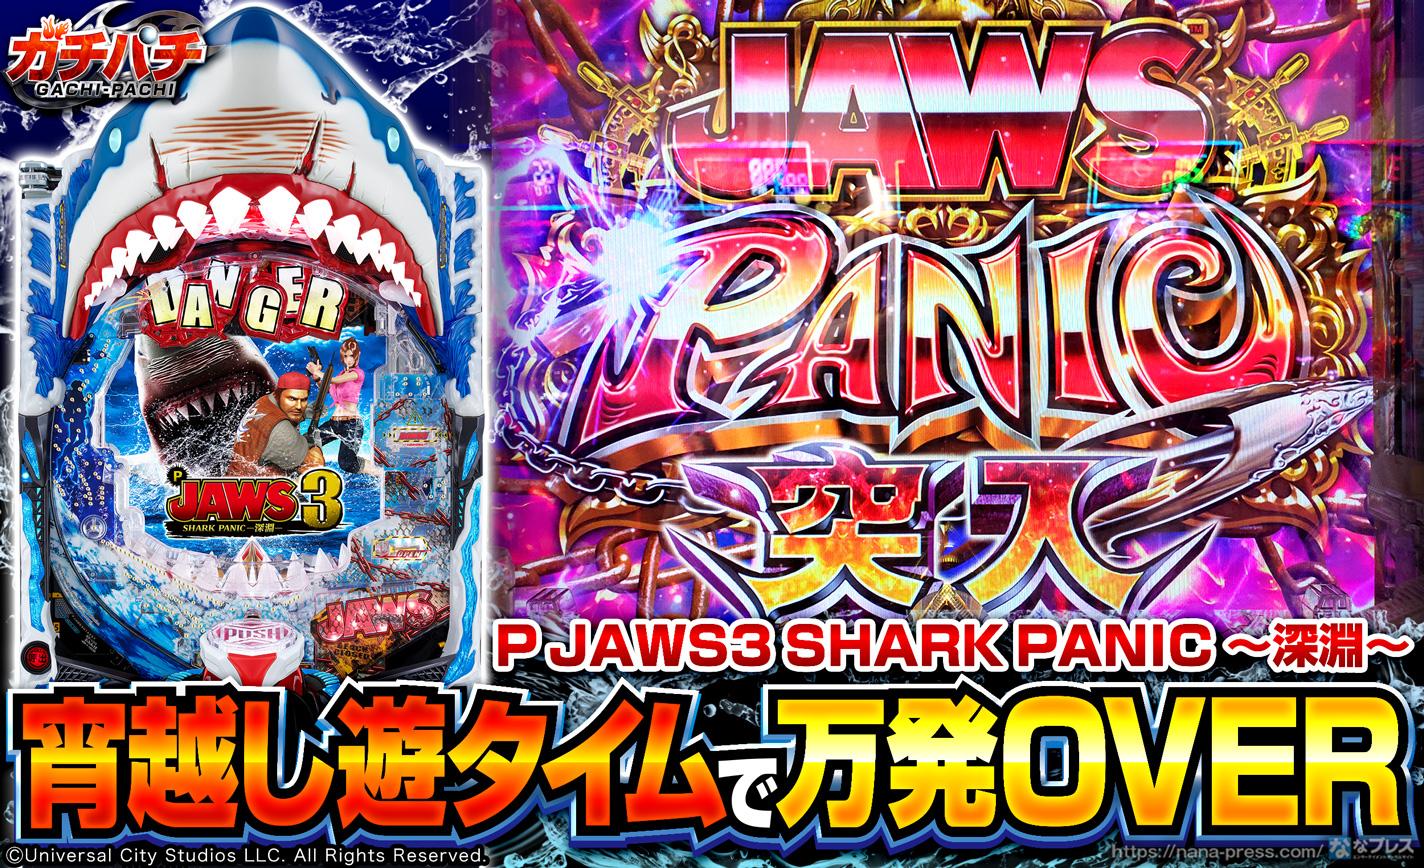 【P JAWS3 SHARK PANIC~深淵~】宵越し遊タイムで万発OVER!初実戦のホールで立ち回ってみた eyecatch-image